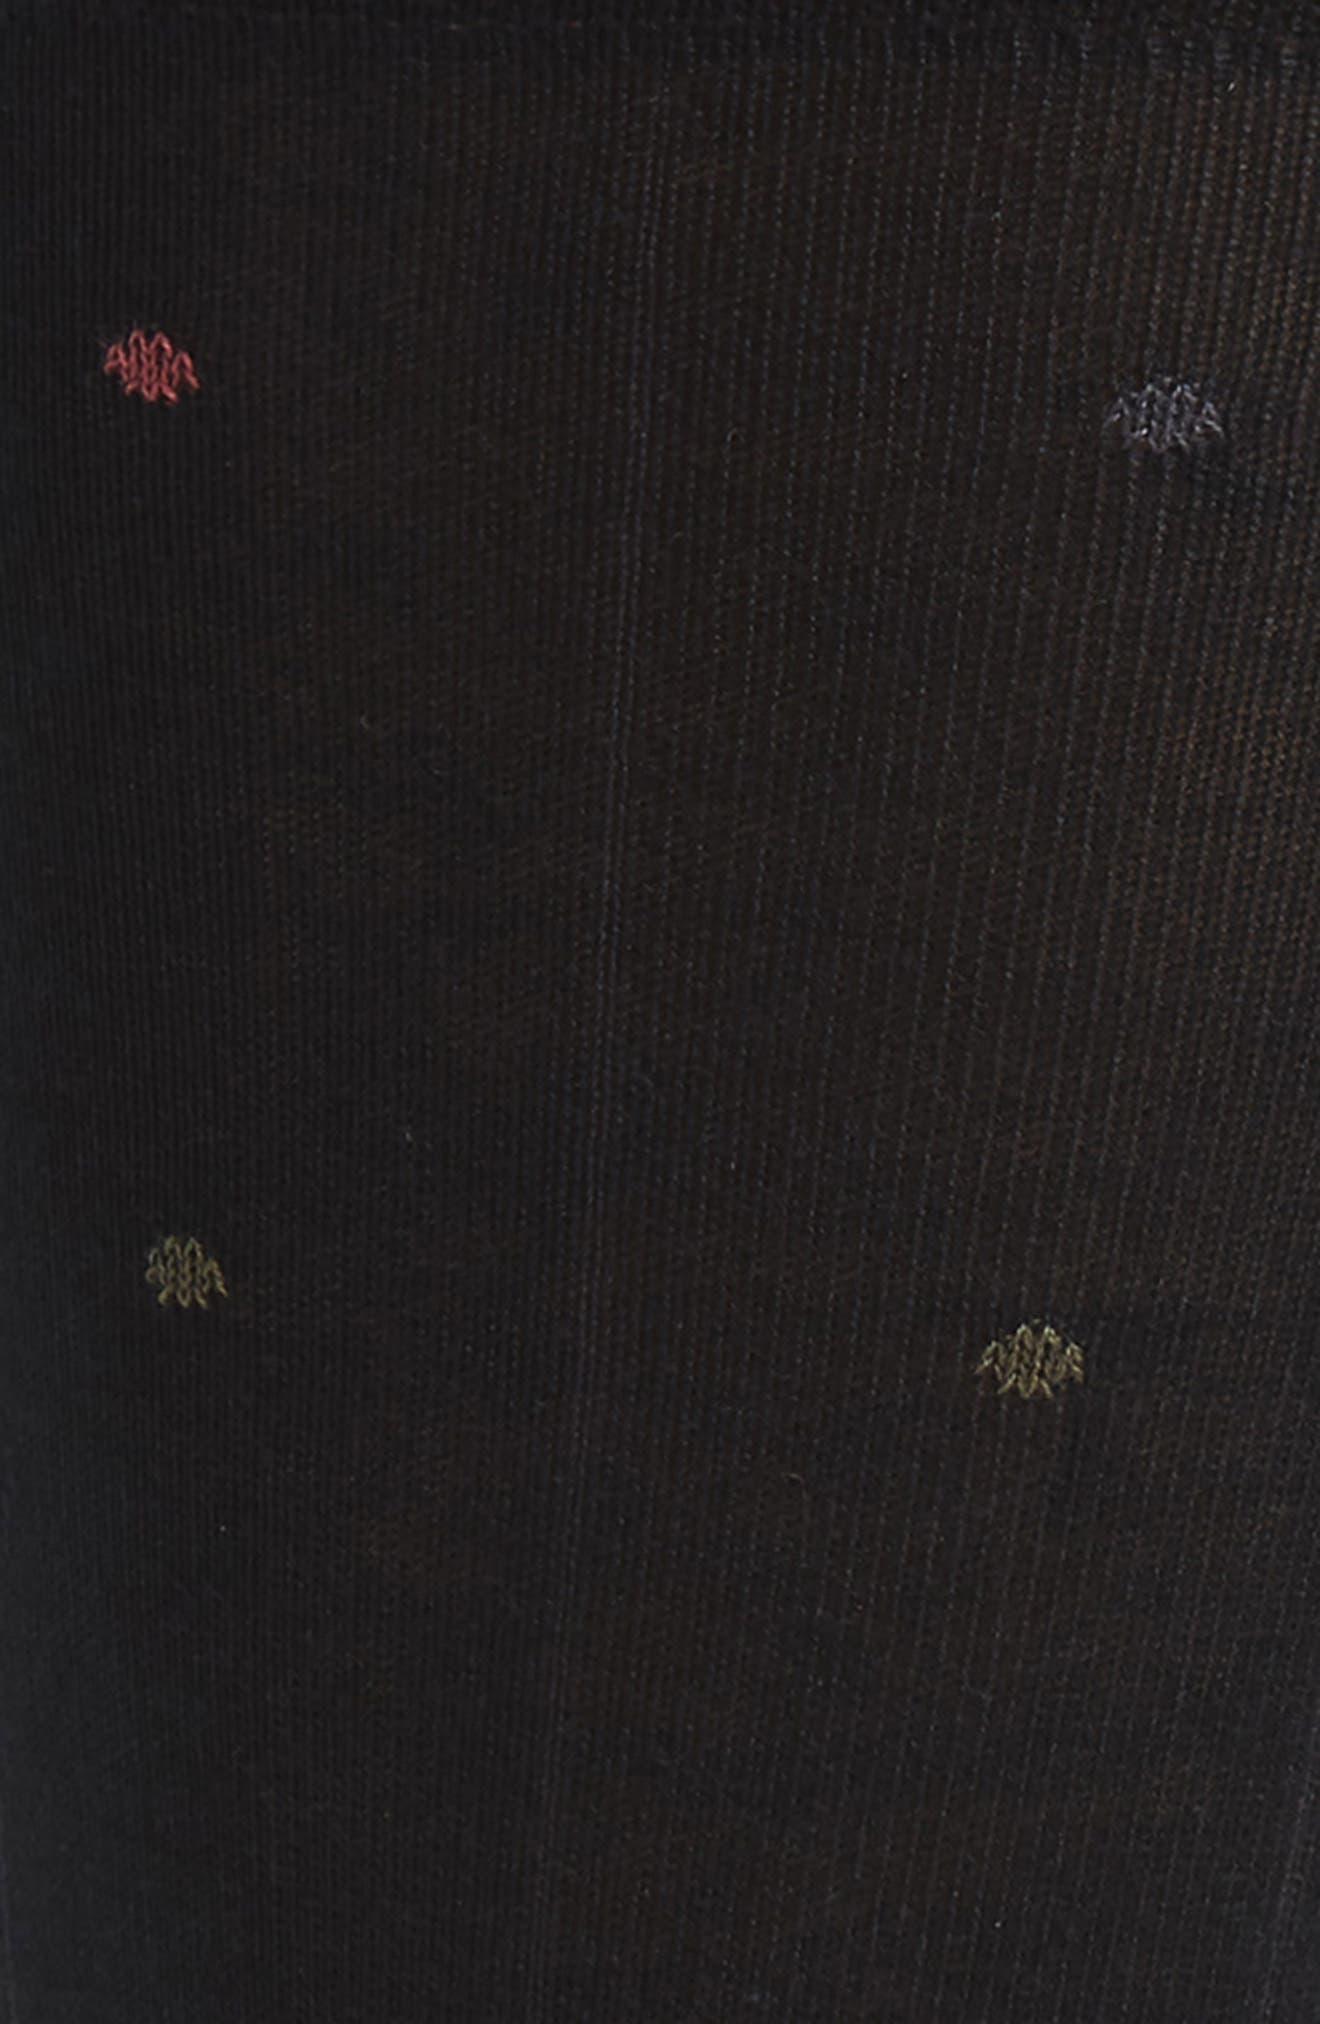 Dot Socks,                             Alternate thumbnail 2, color,                             BLACK/ OLIVE